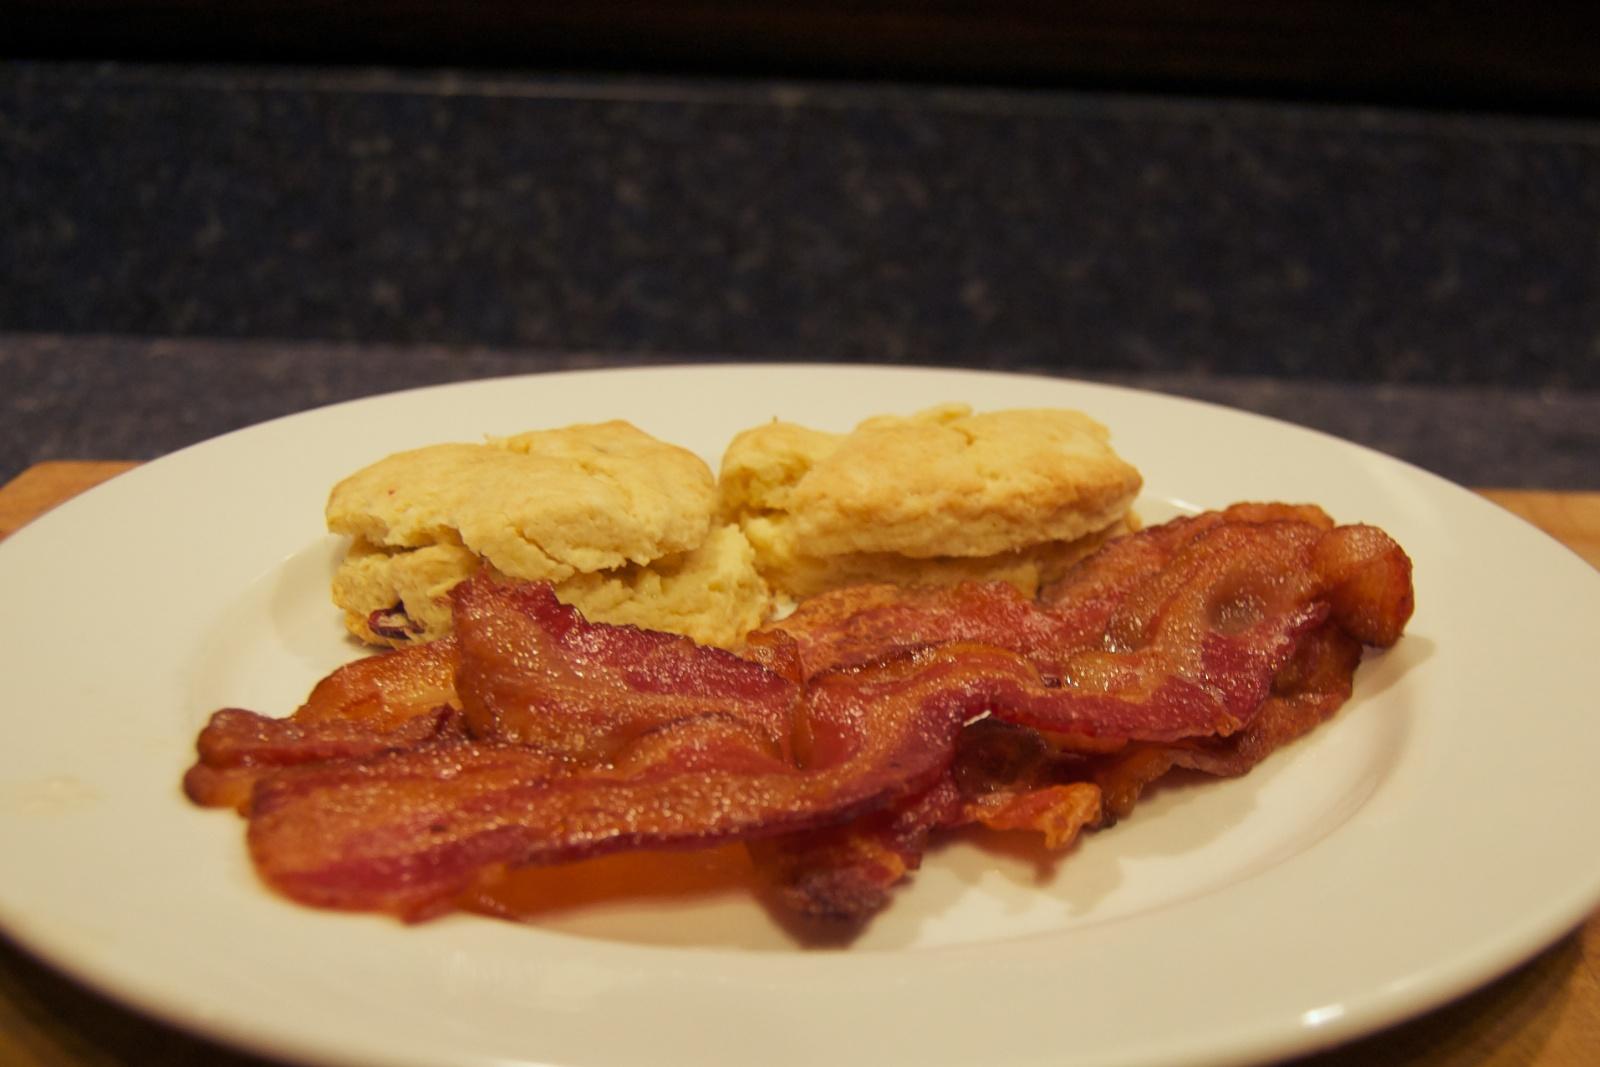 http://blog.rickk.com/food/2013/01/12/ate.2013.01.12.b.jpg